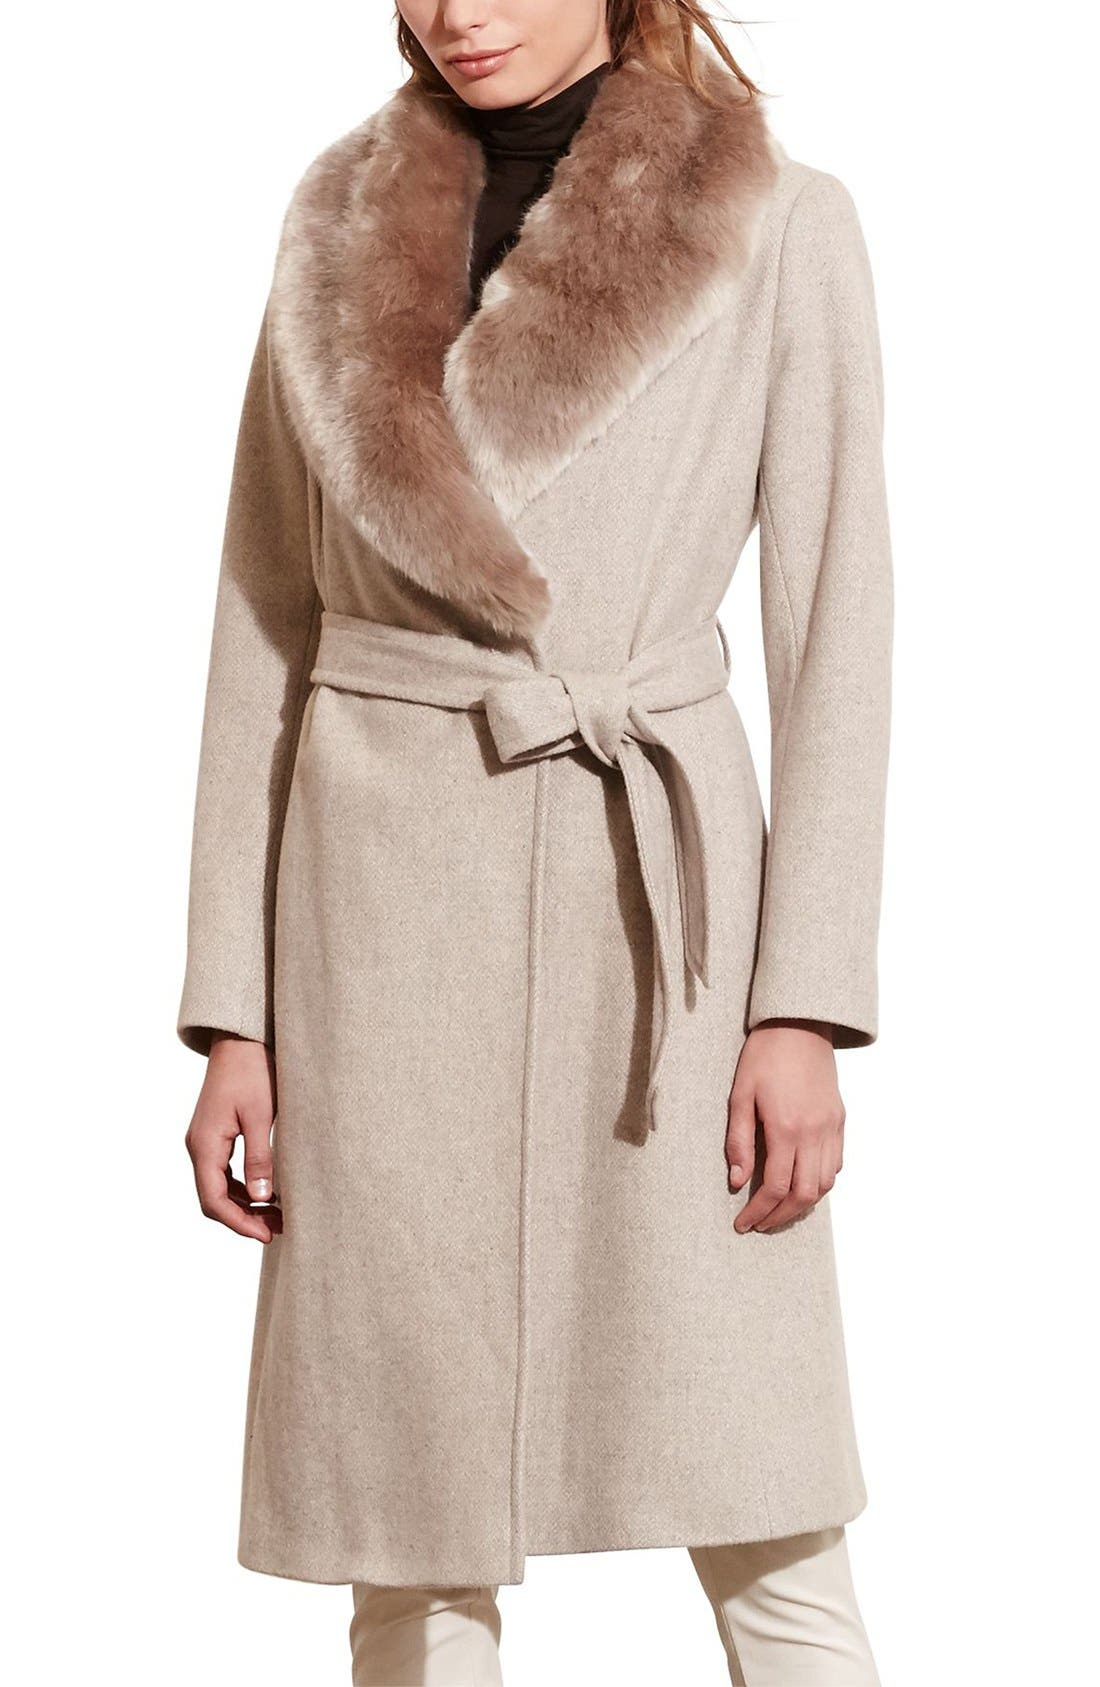 Alternate Image 1 Selected - Lauren Ralph Lauren Faux Fur Collar Wool Blend Long Wrap Coat